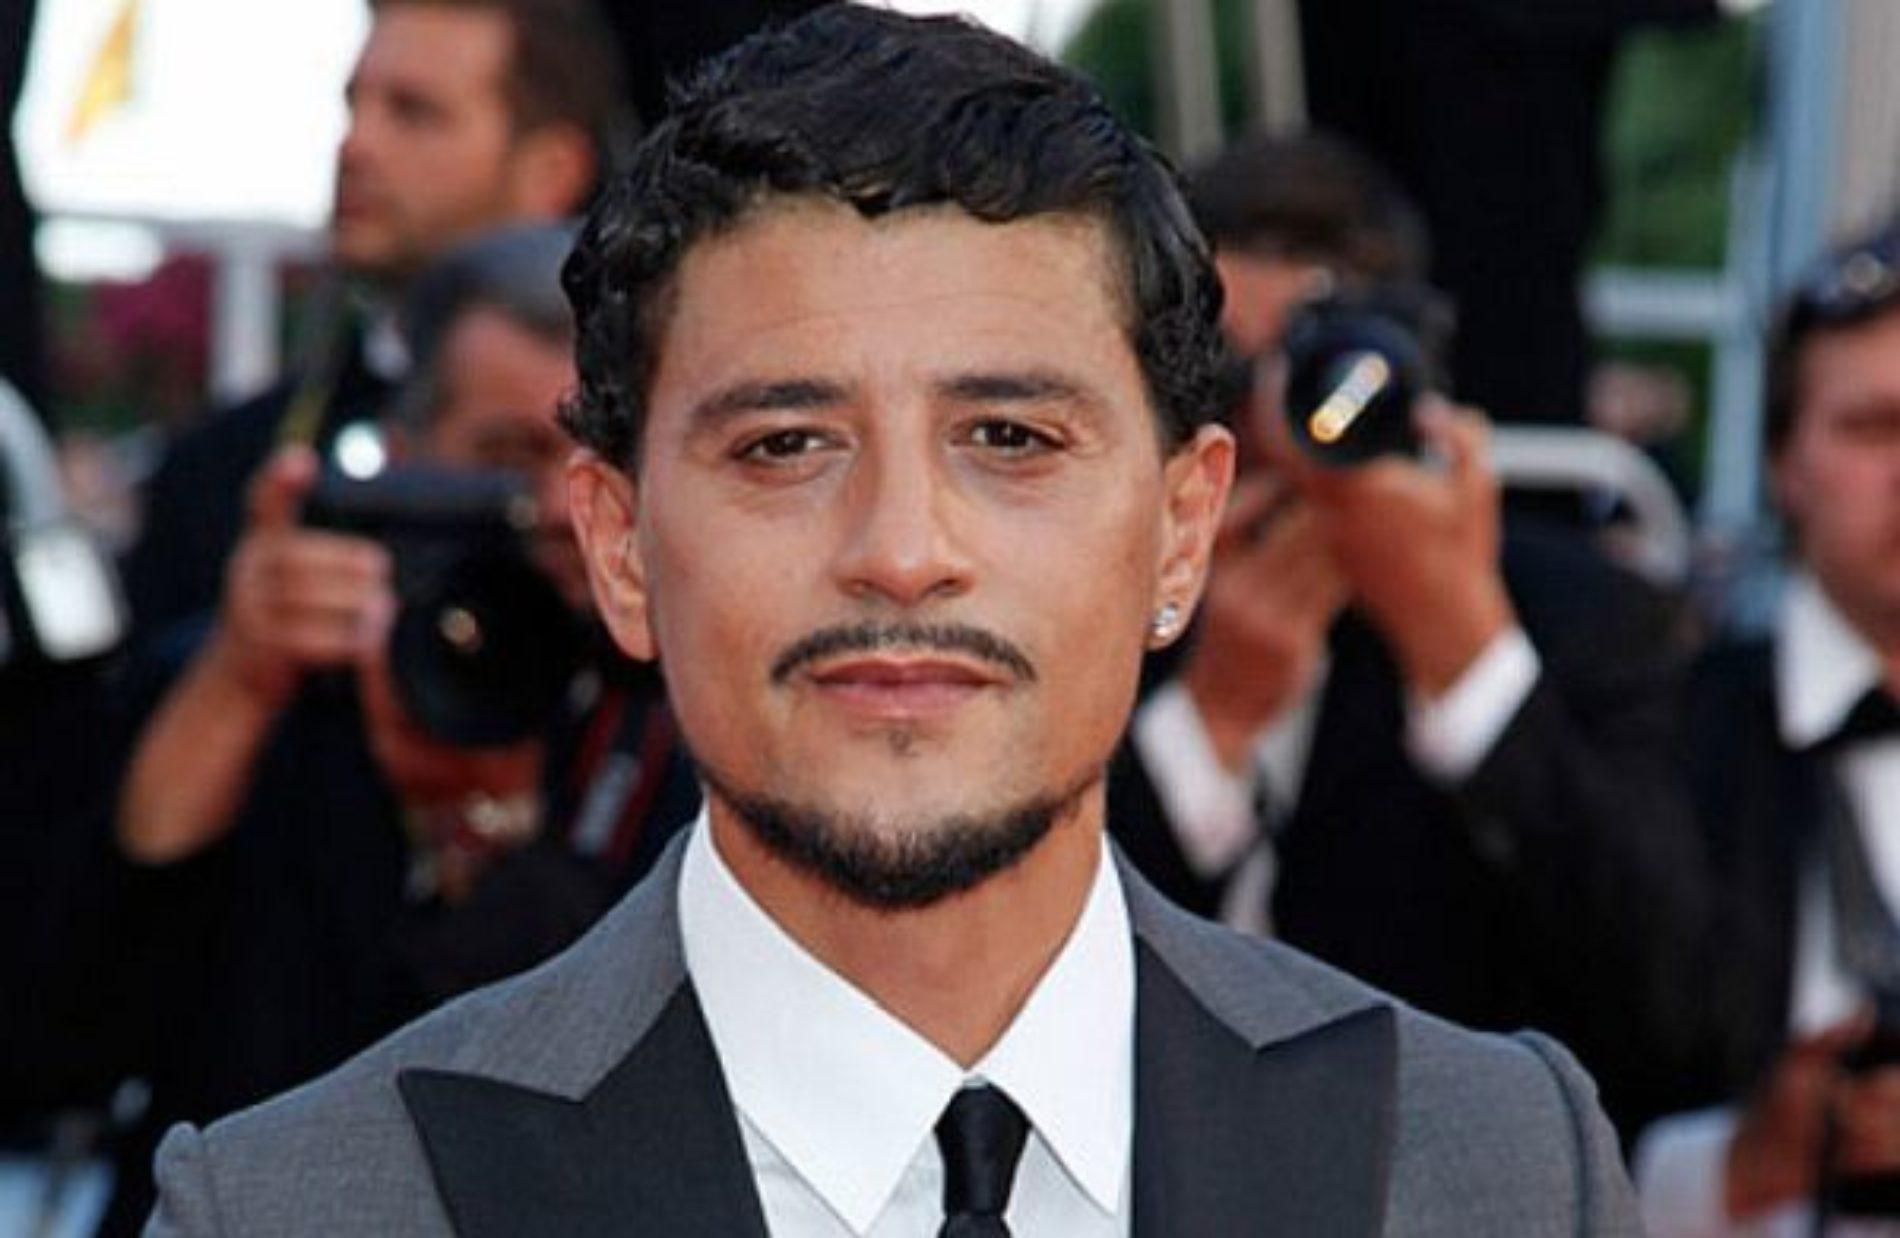 Saïd Taghmaoui el posible villano de 'Bond 25'